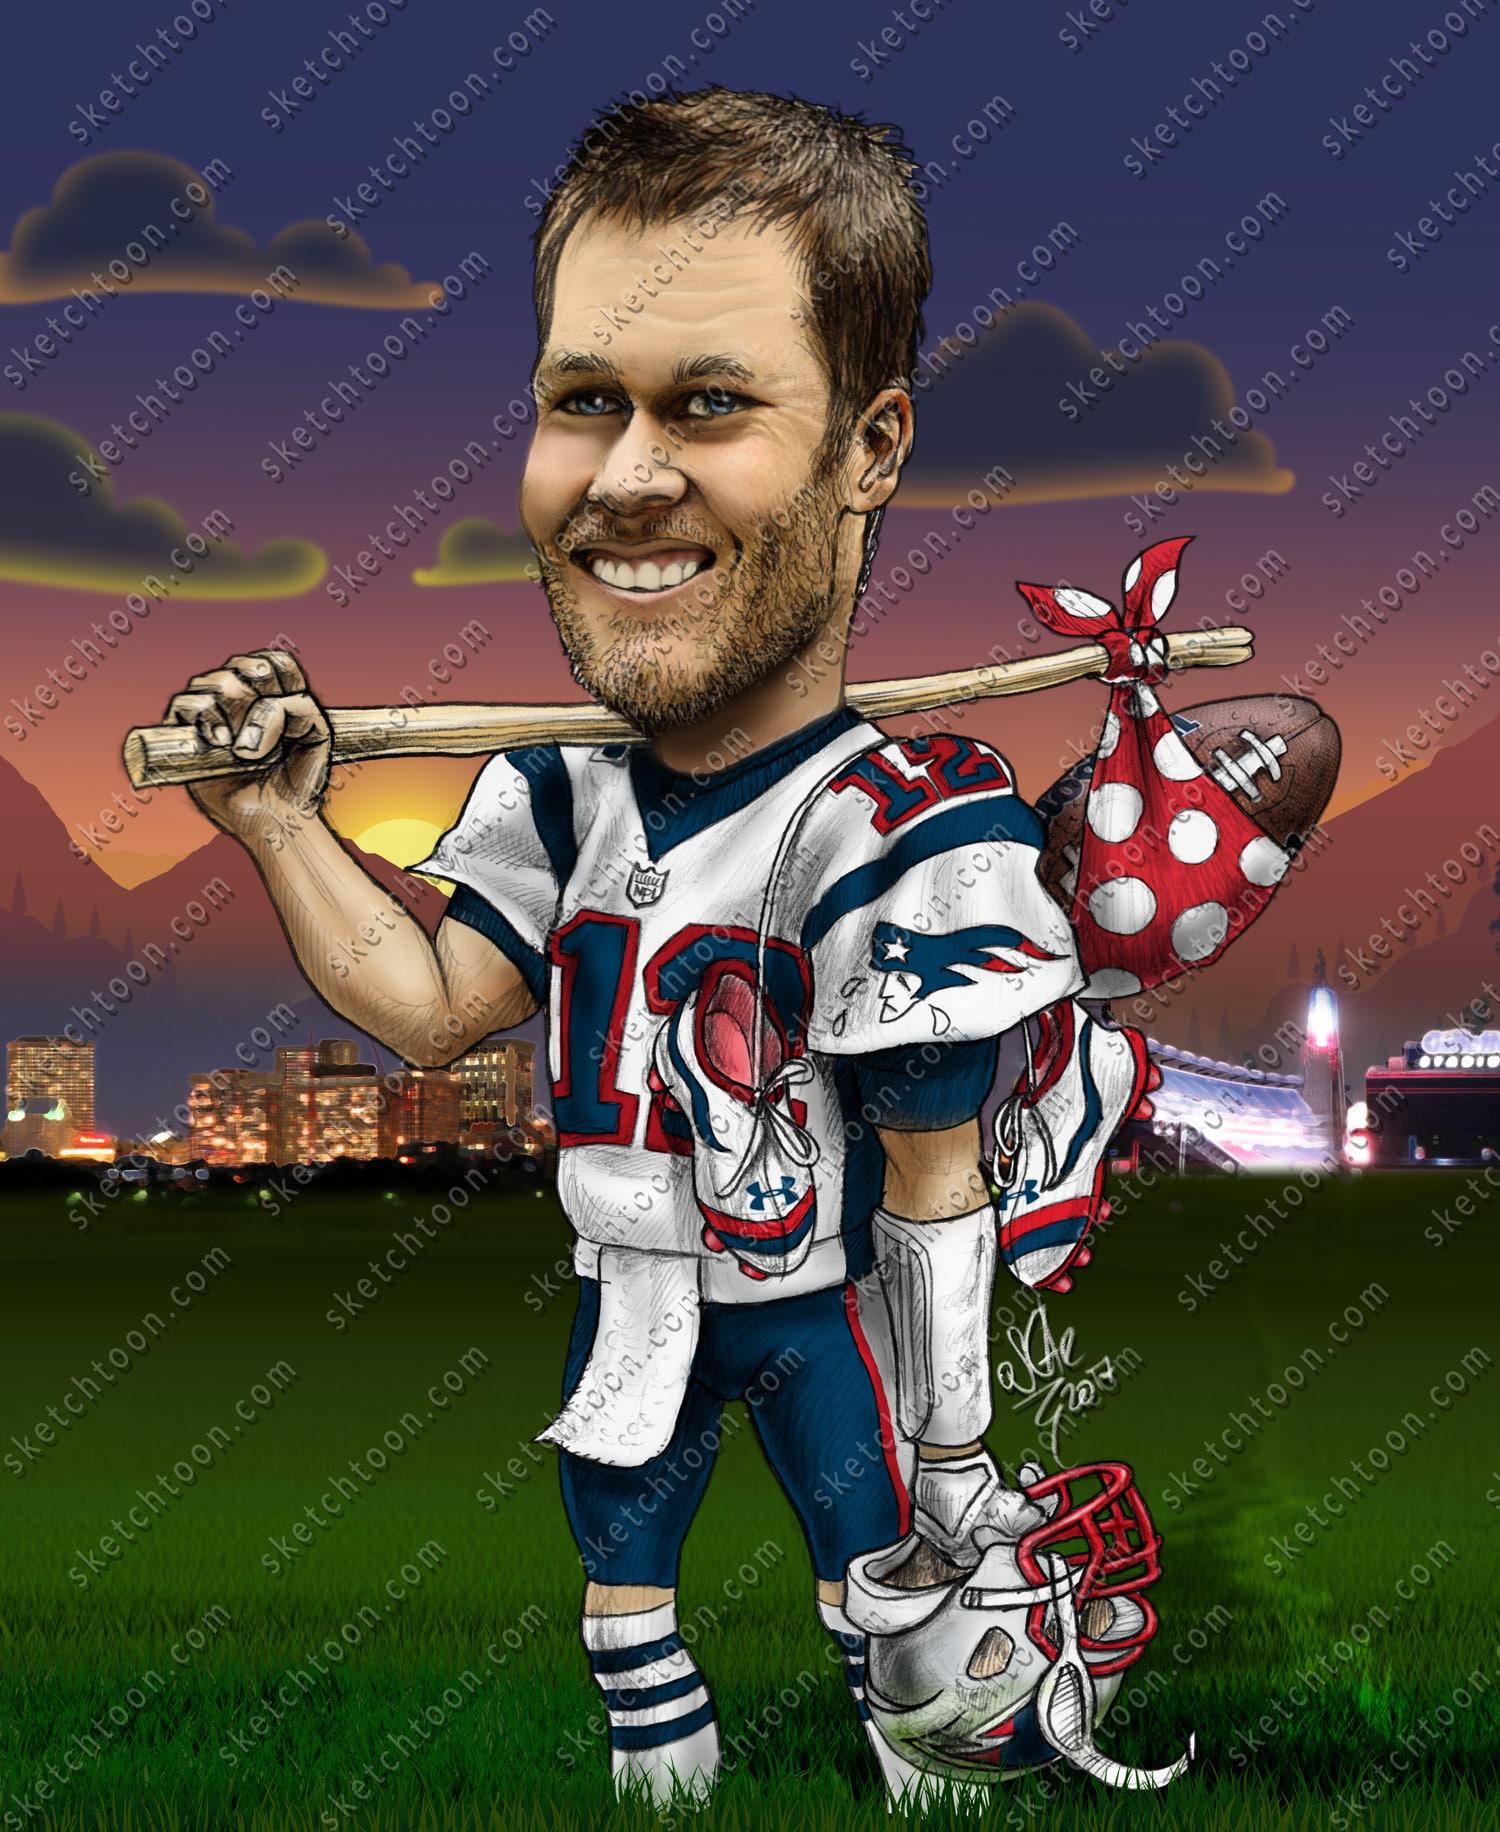 Tom-Brady-retirement-2019